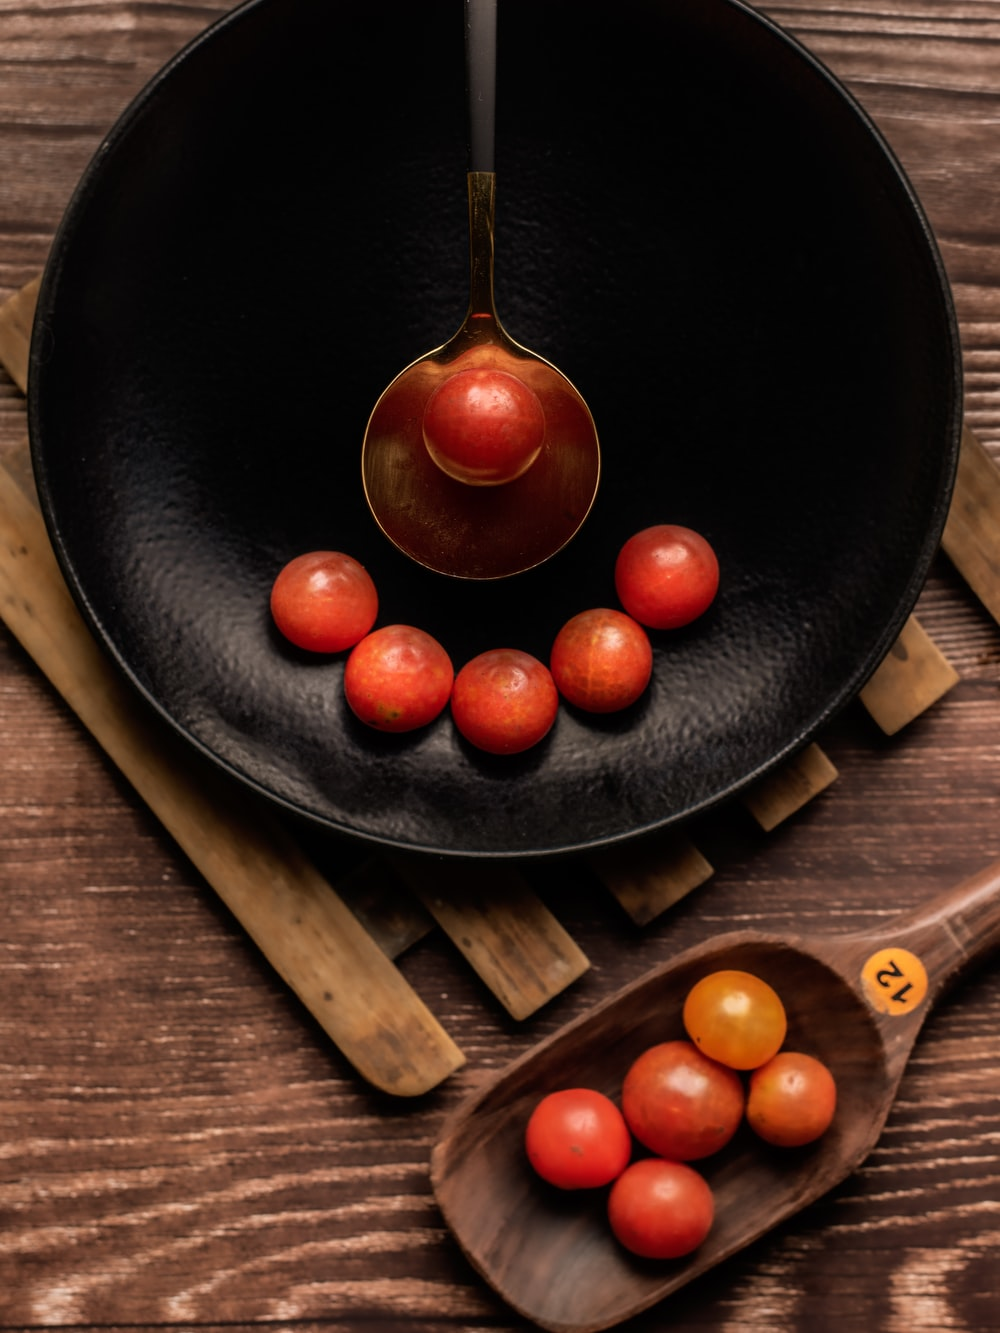 red tomato on black ceramic plate